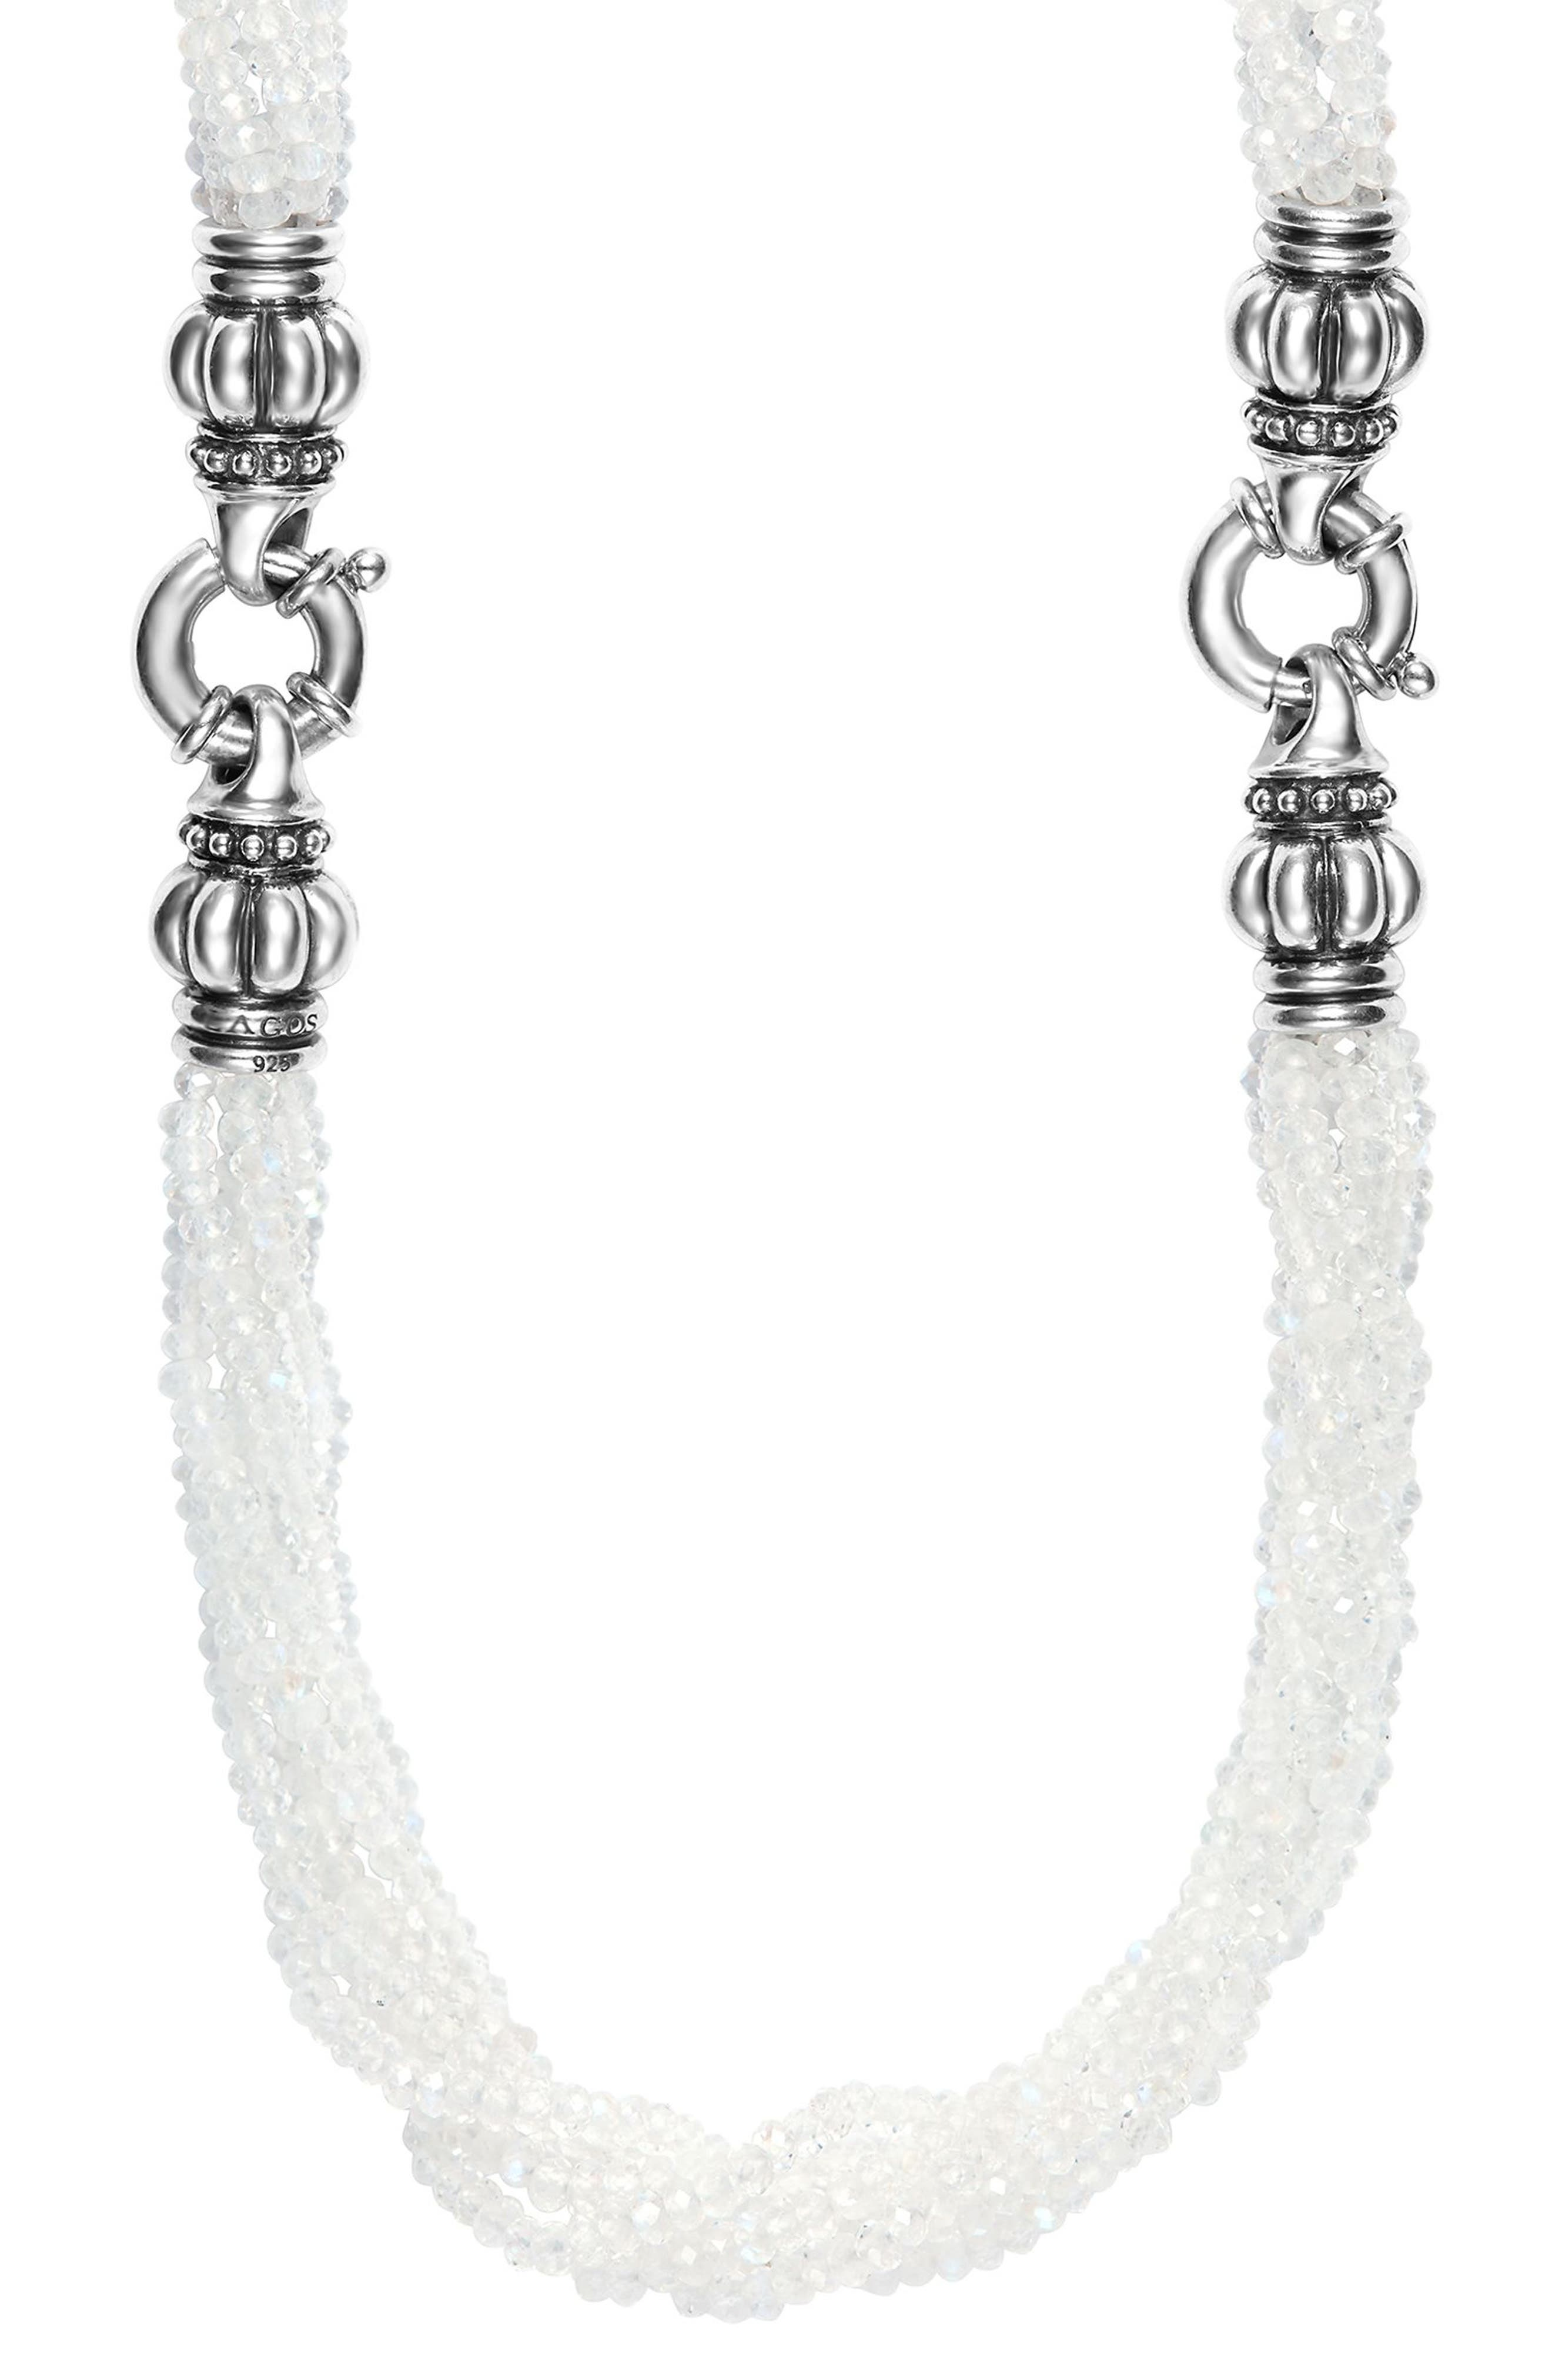 Alternate Image 1 Selected - LAGOS Caviar Icon Bead Convertible Bracelet & Necklace